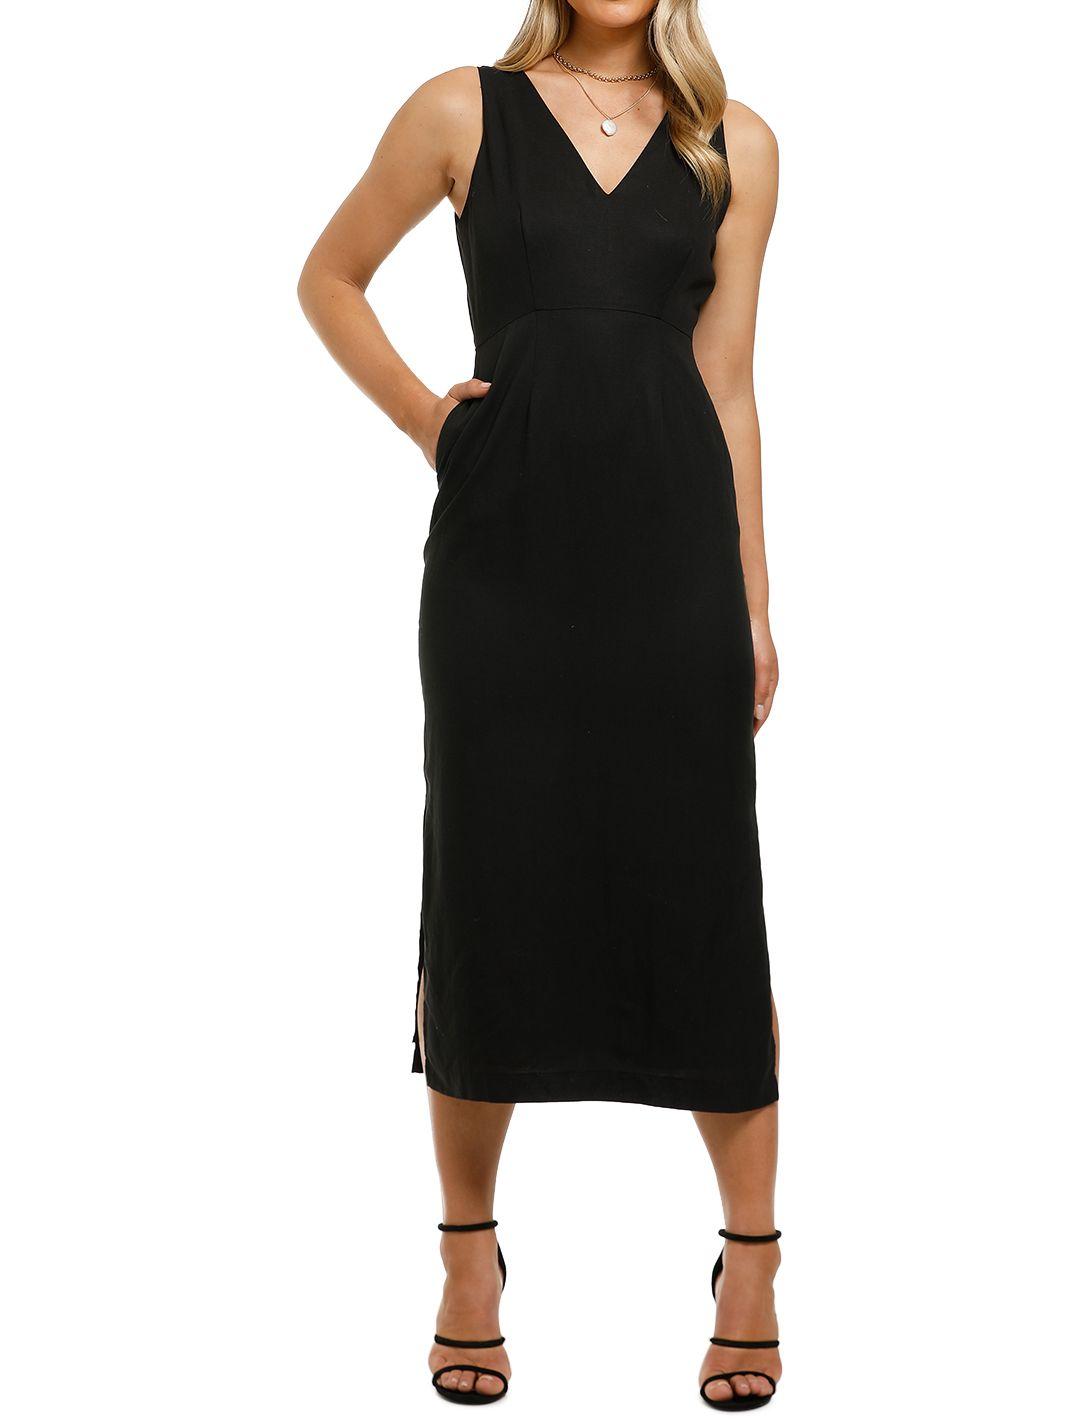 Saints-the-Label-Toorak-Dress-Black-Front